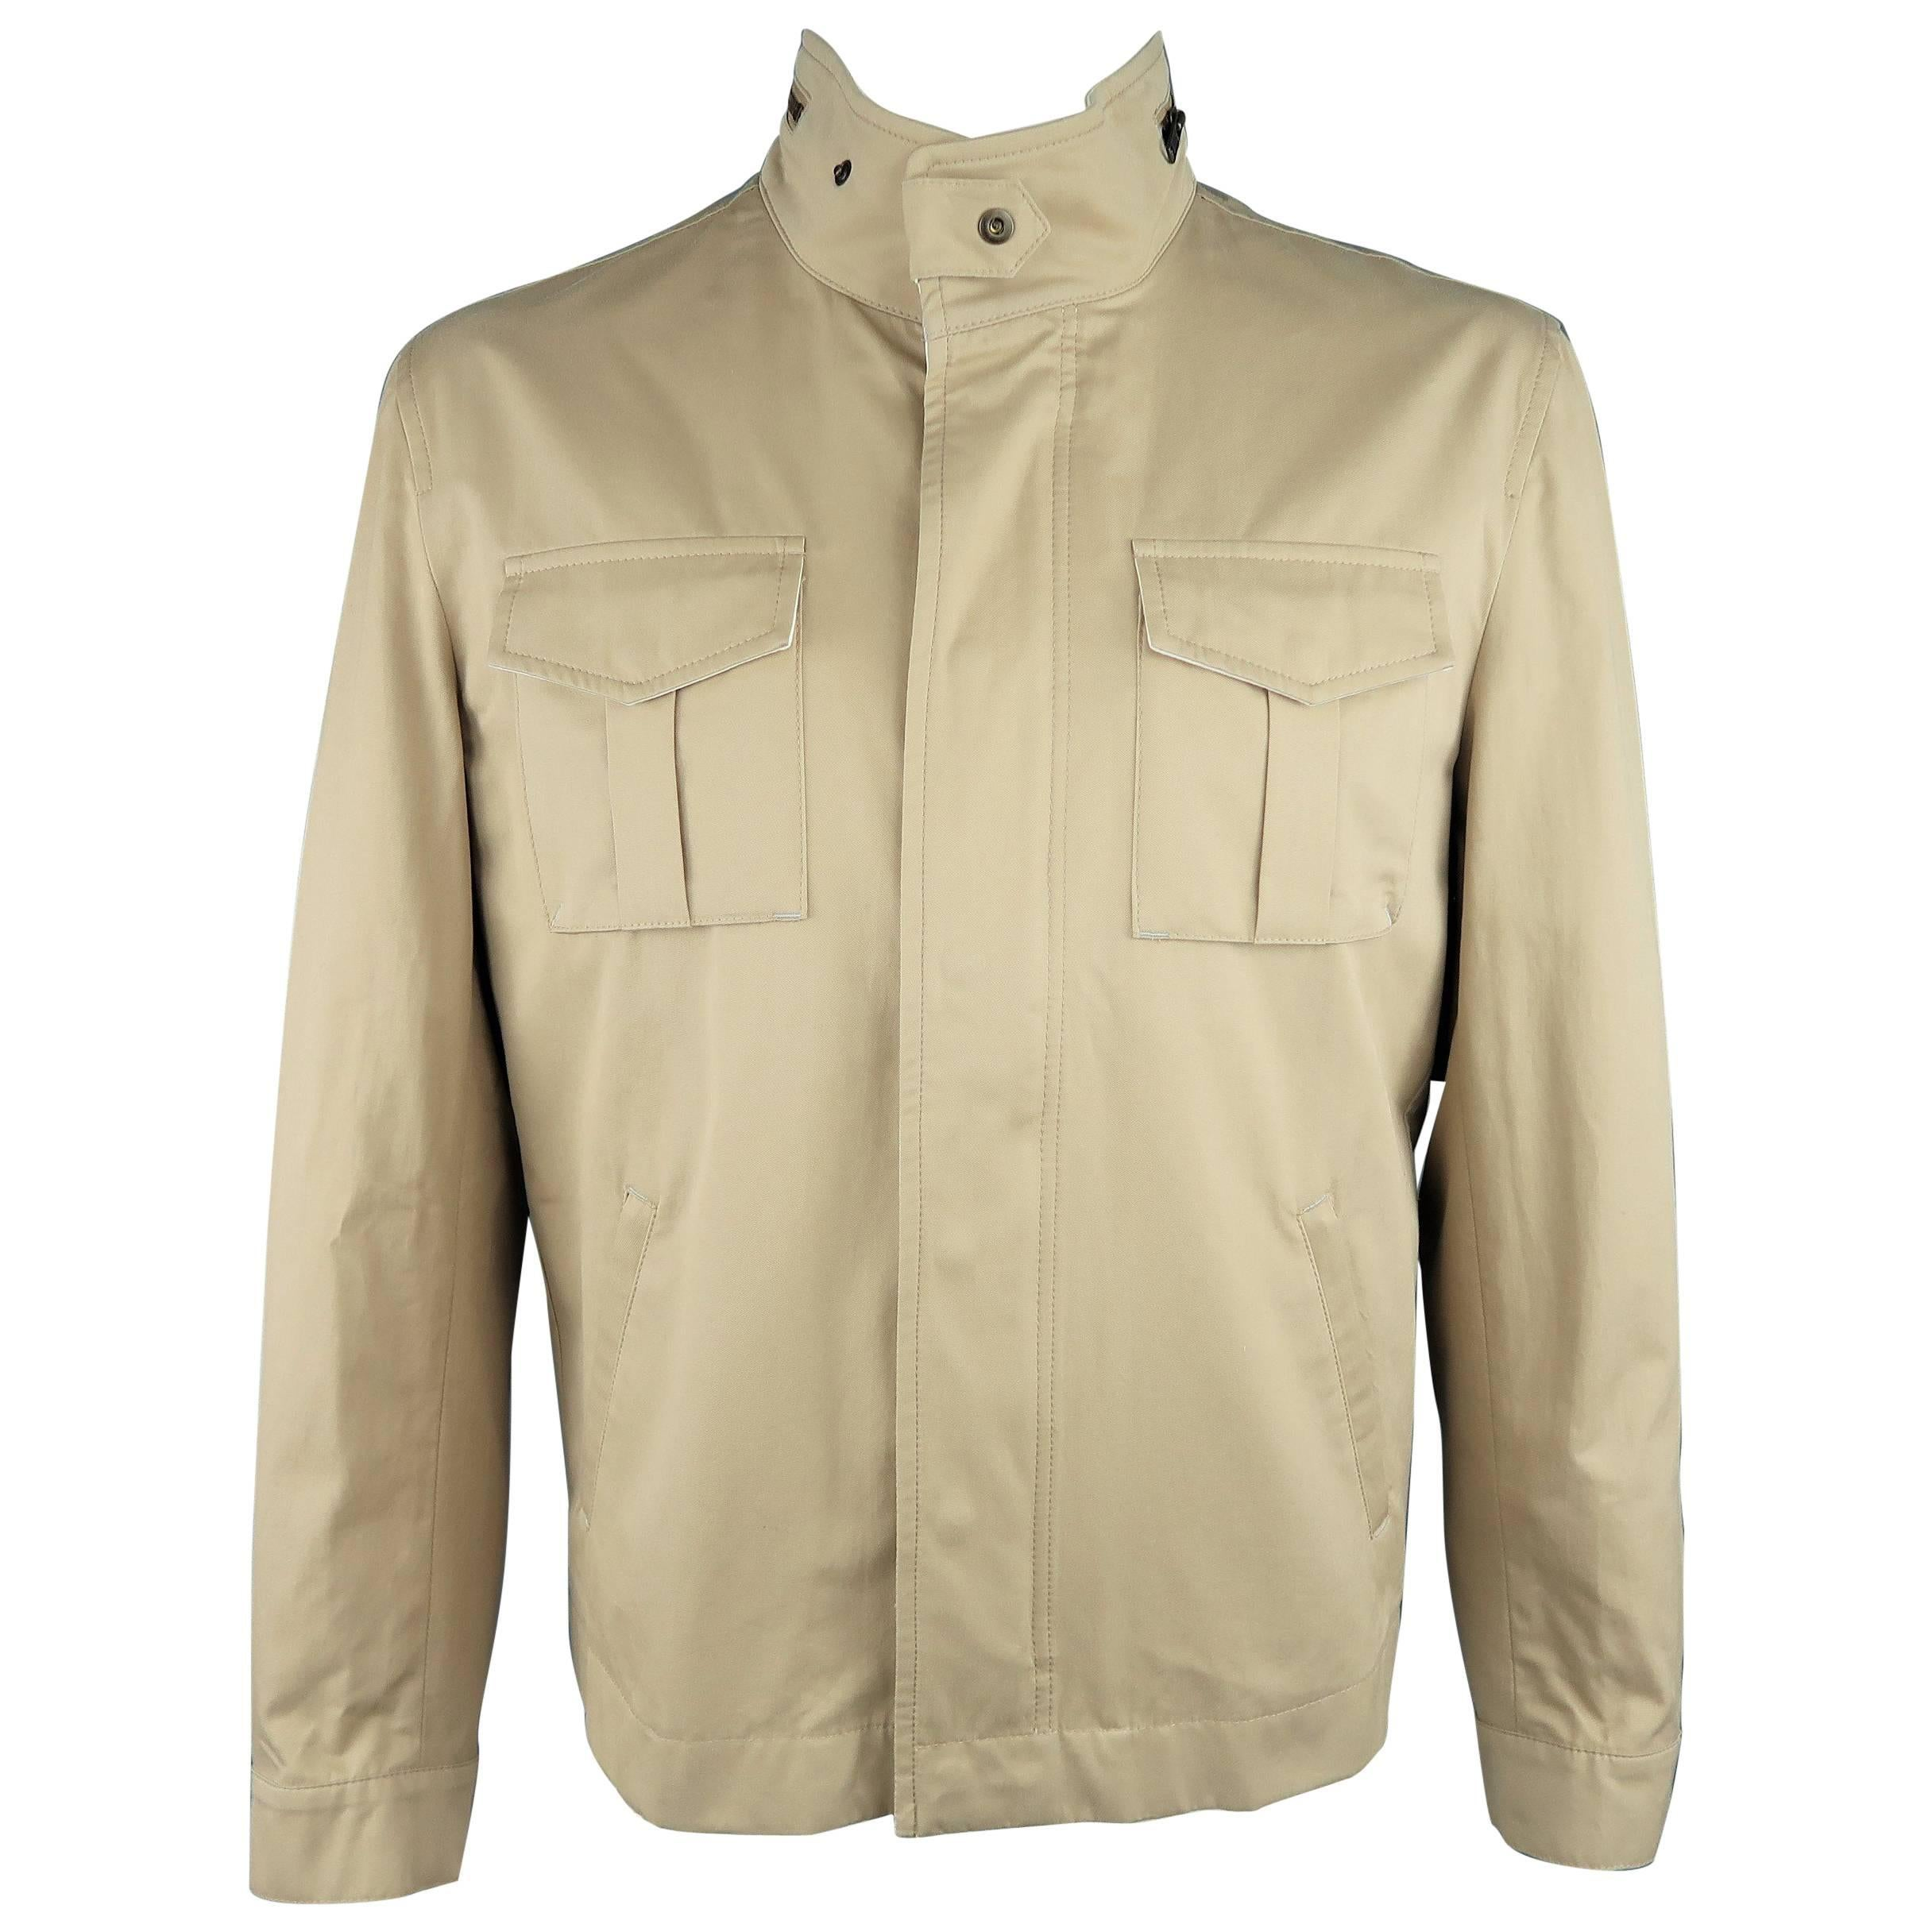 fdde85e51 Men's BRUNELLO CUCINELLI L Khaki Cotton High Collar Military Pocket Jacket